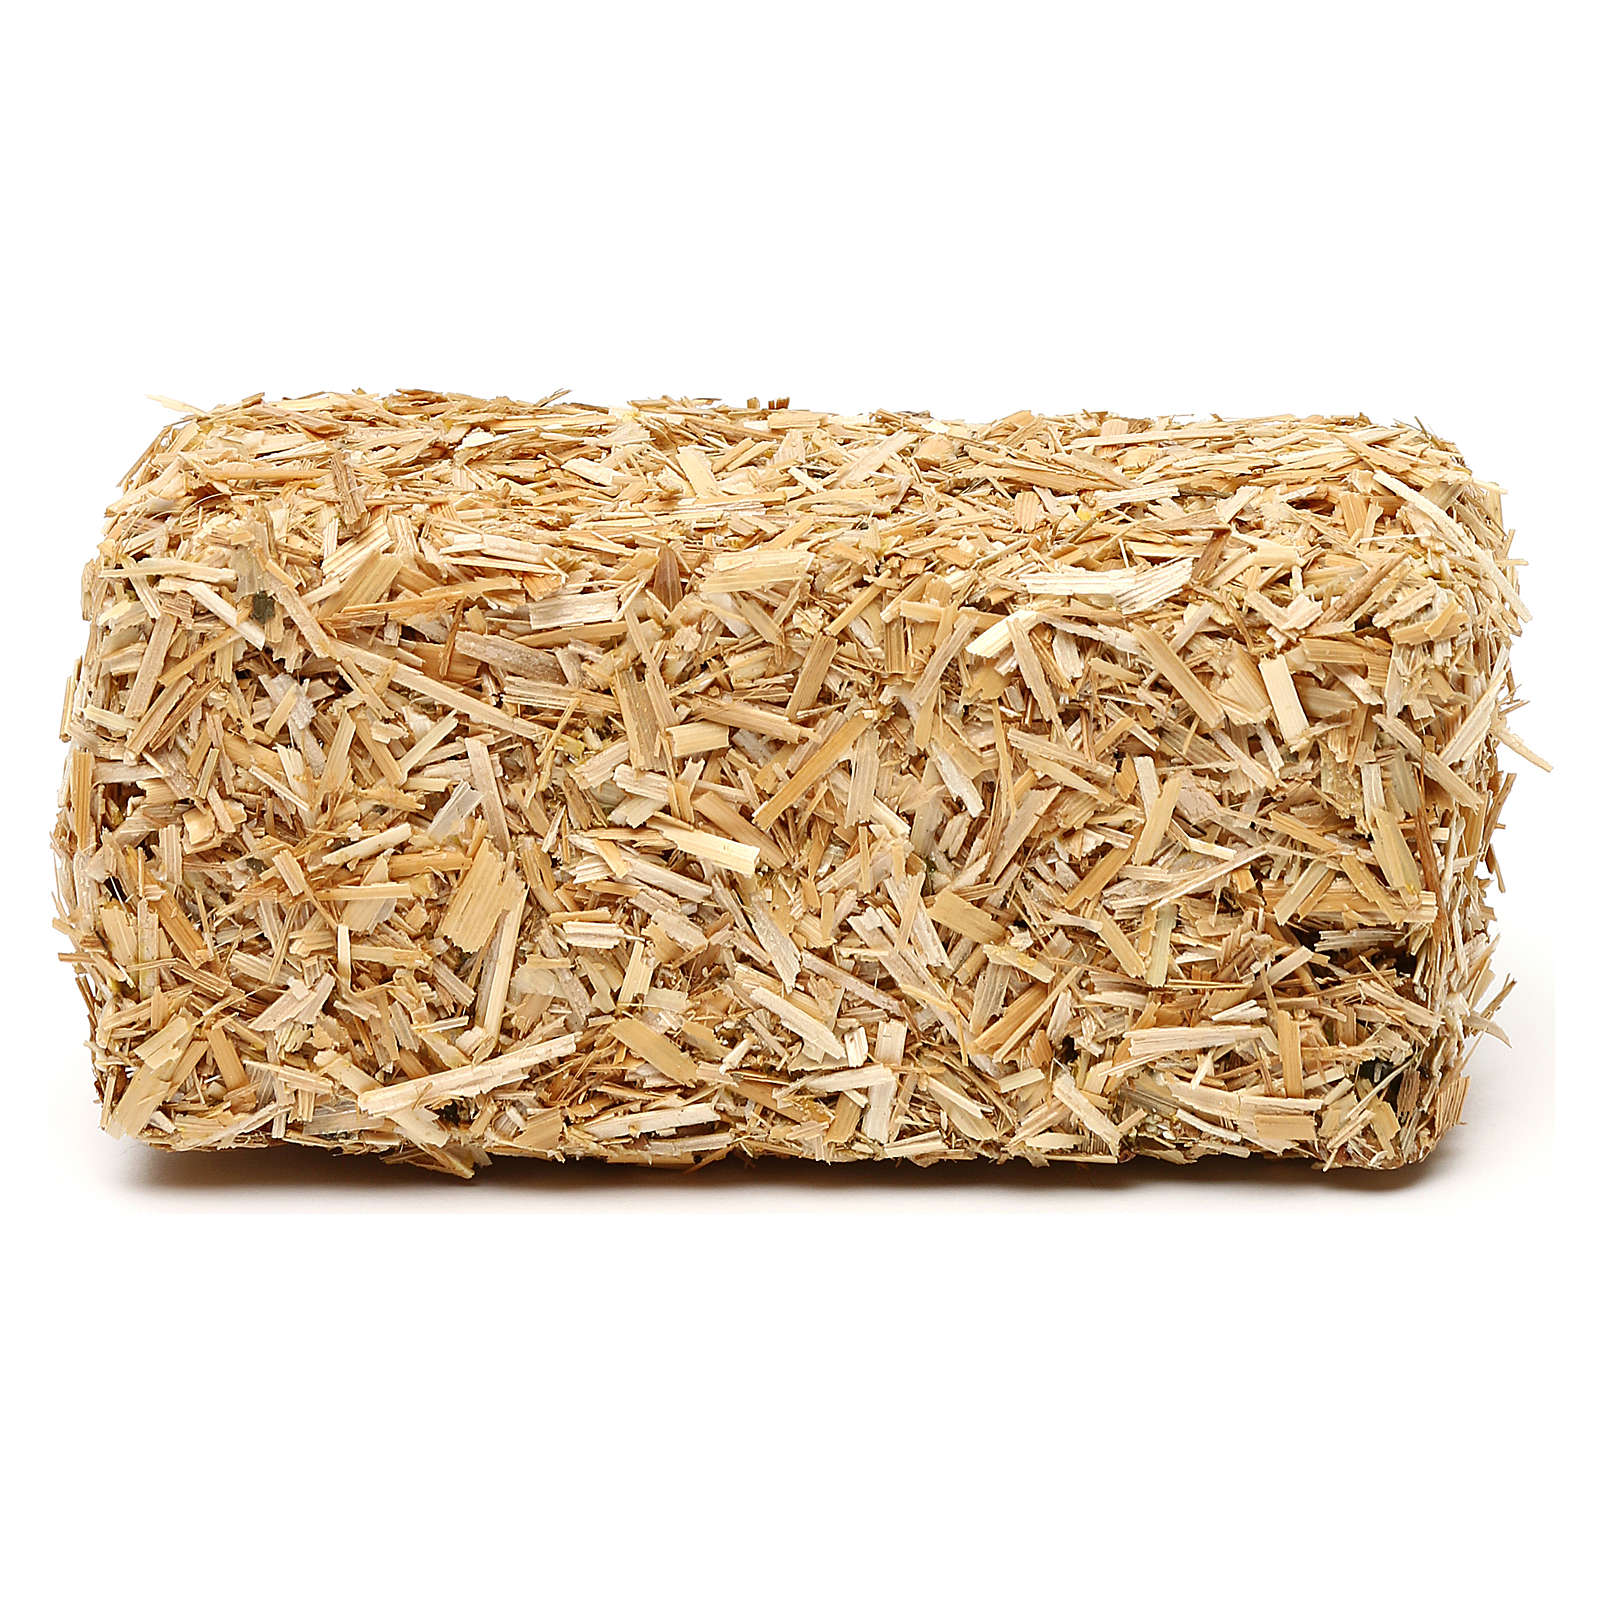 Paca de heno rectangular 4x10x5 cm para belenes de 19 cm 4